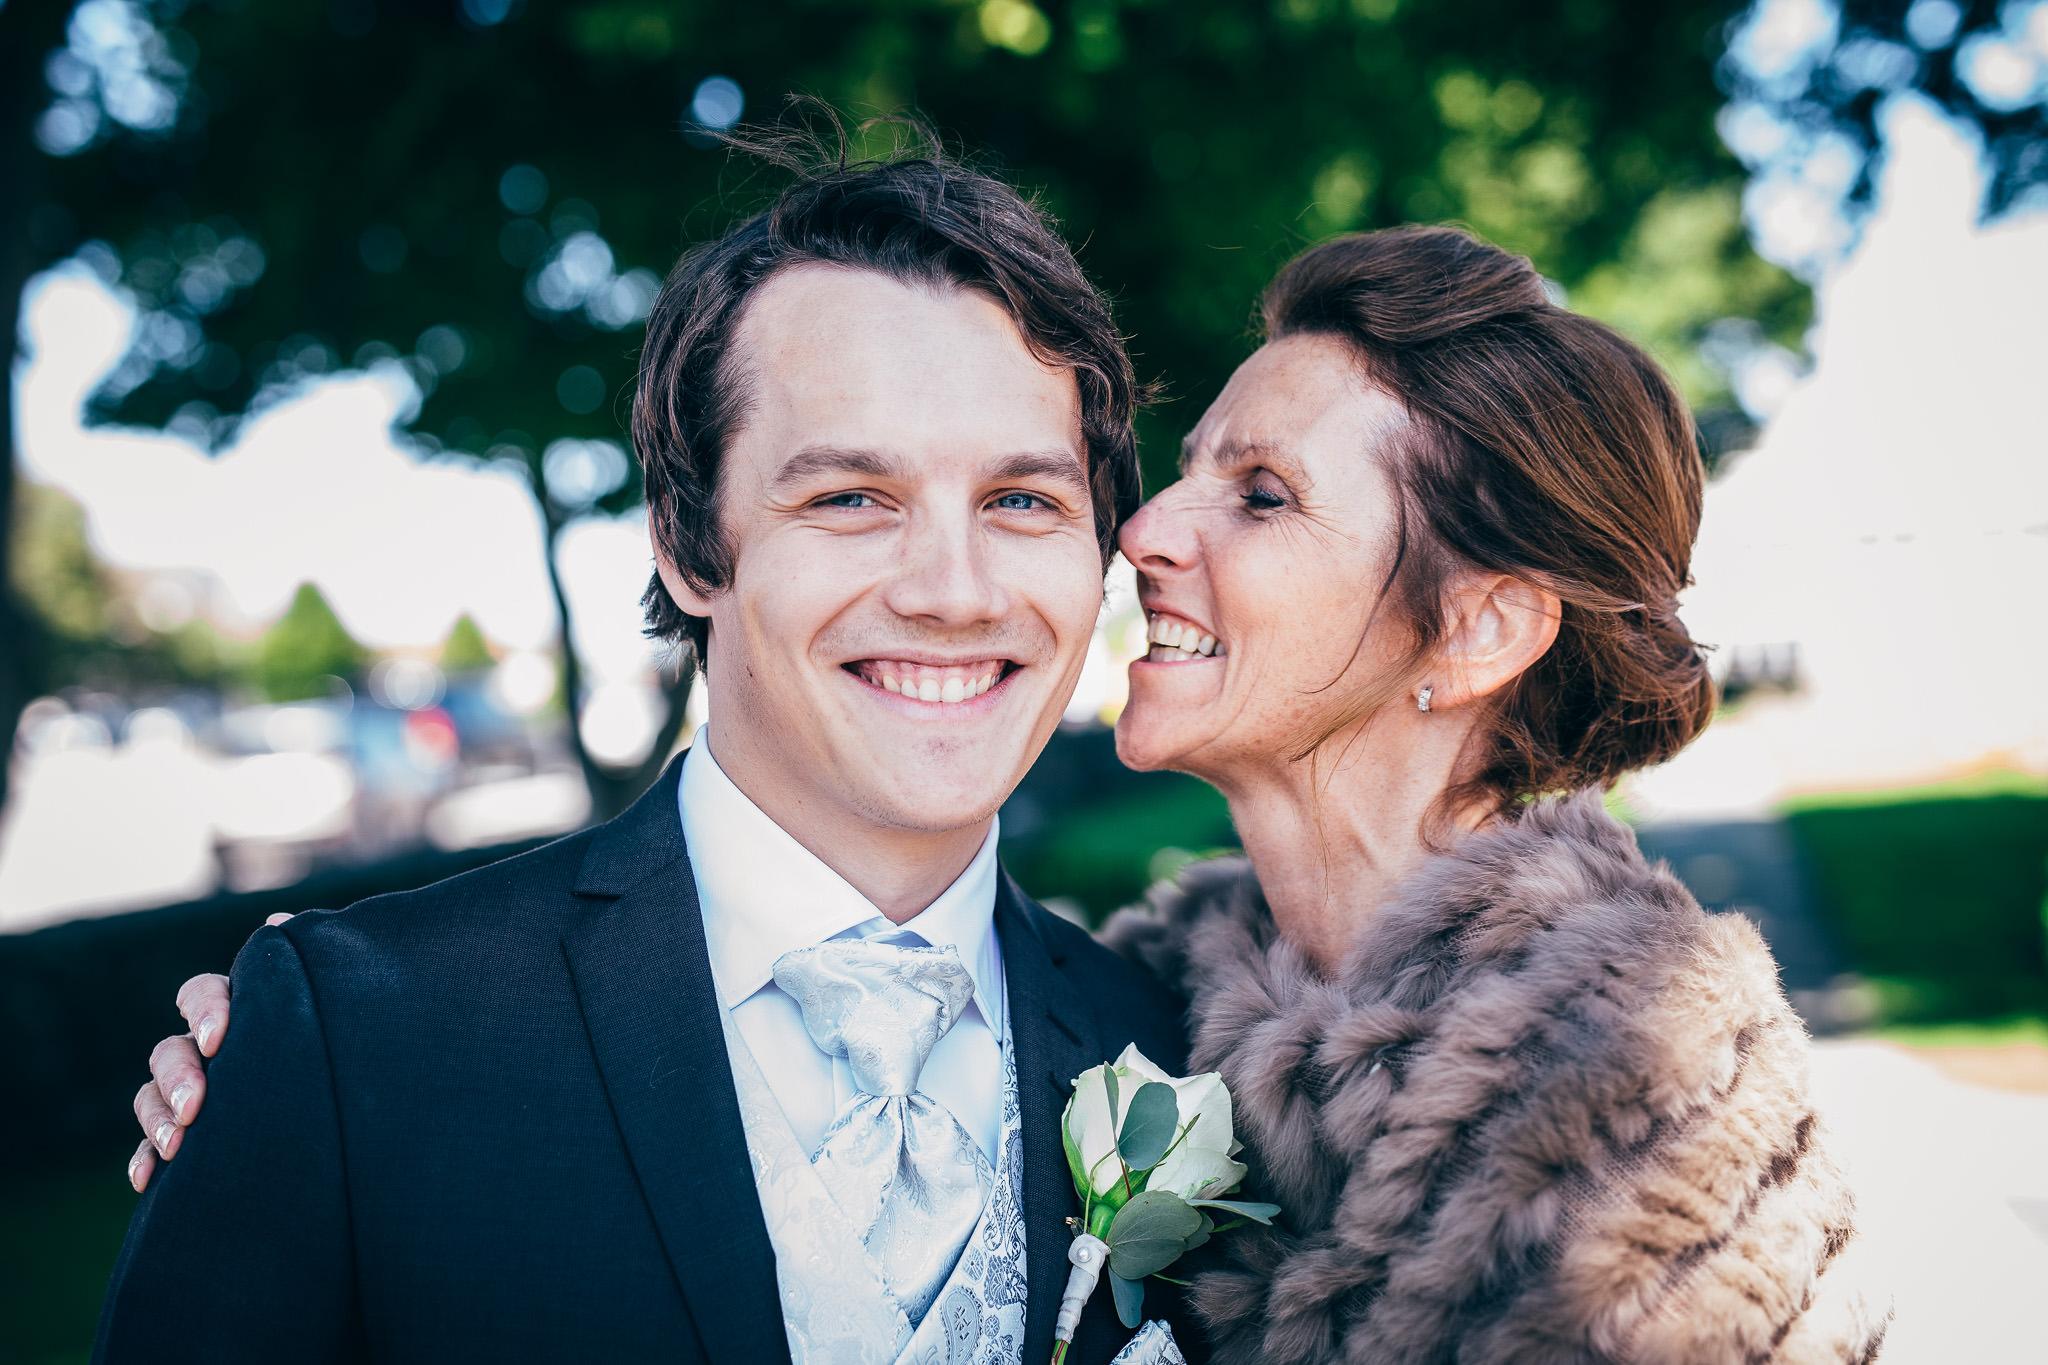 Wedding+Photographer+Norway+Bryllupsfotograf+Casey+Arneson+JT-25.jpg